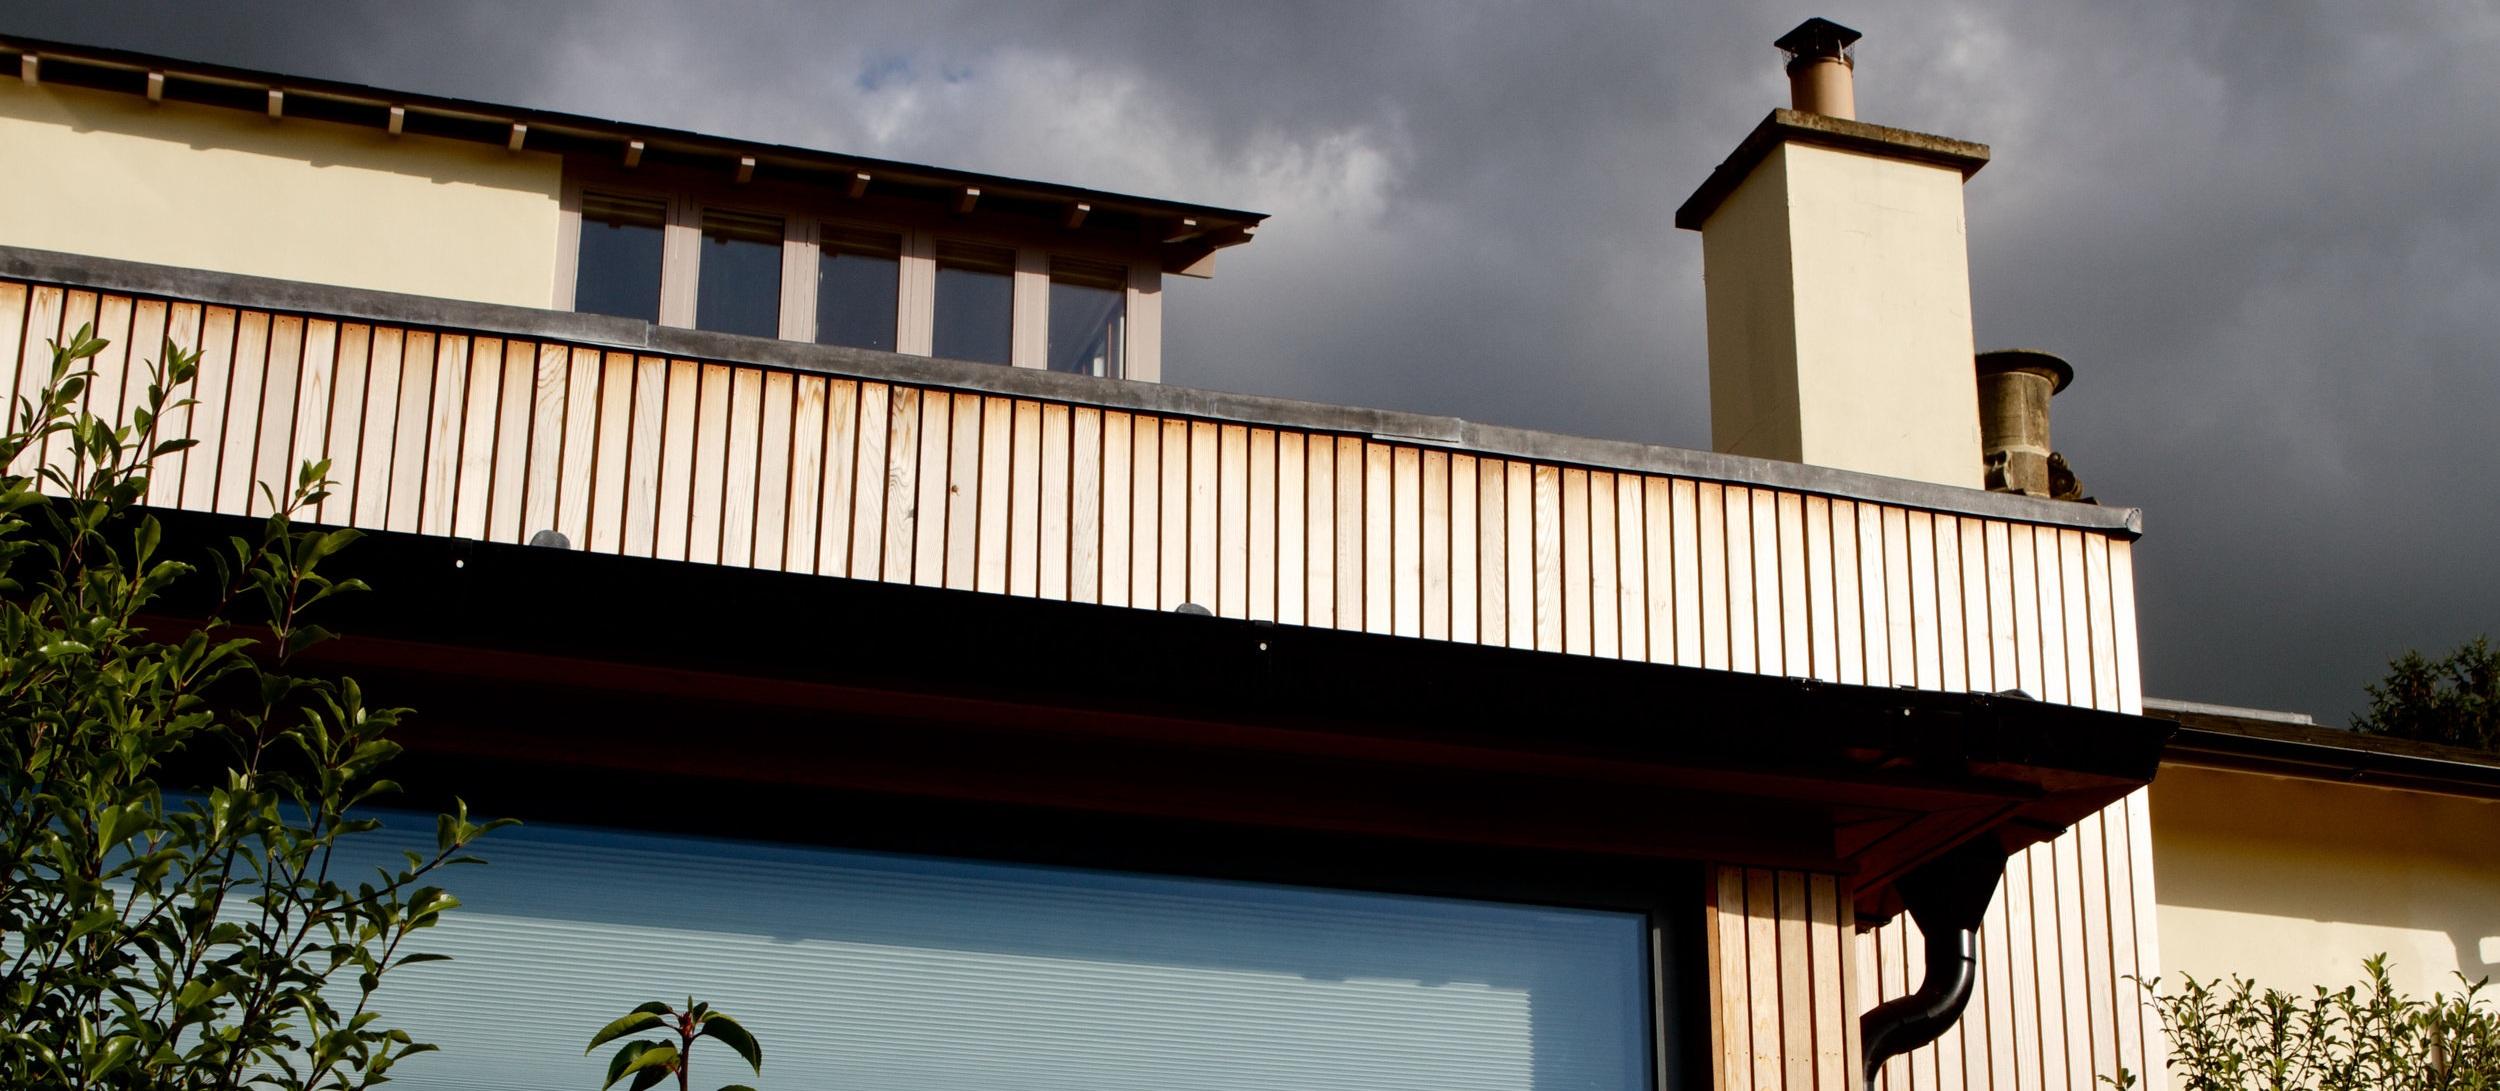 CaSA Architects - Pump House